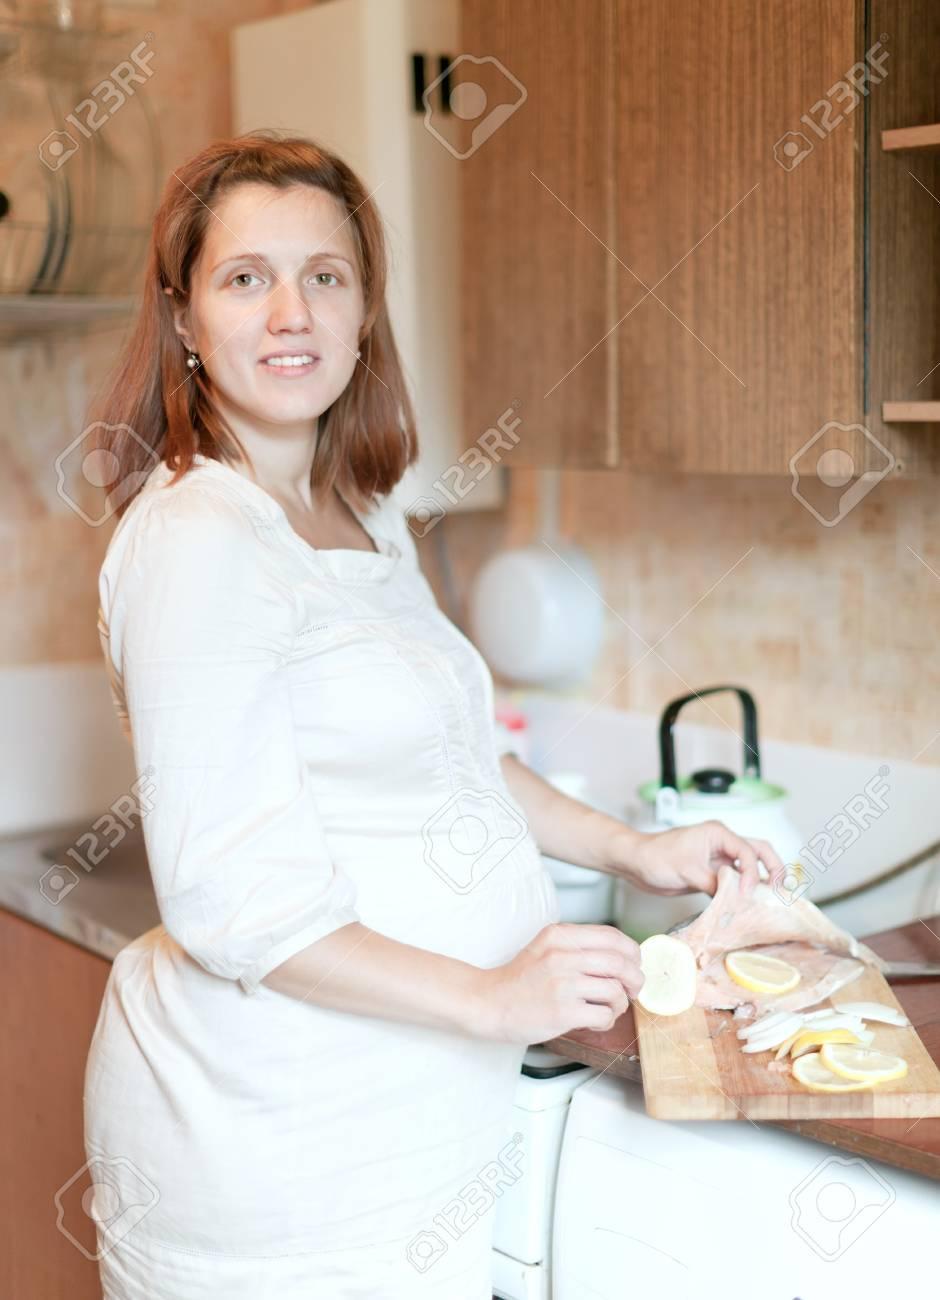 pregnant woman cooks salmon in the kitchen Stock Photo - 15978220